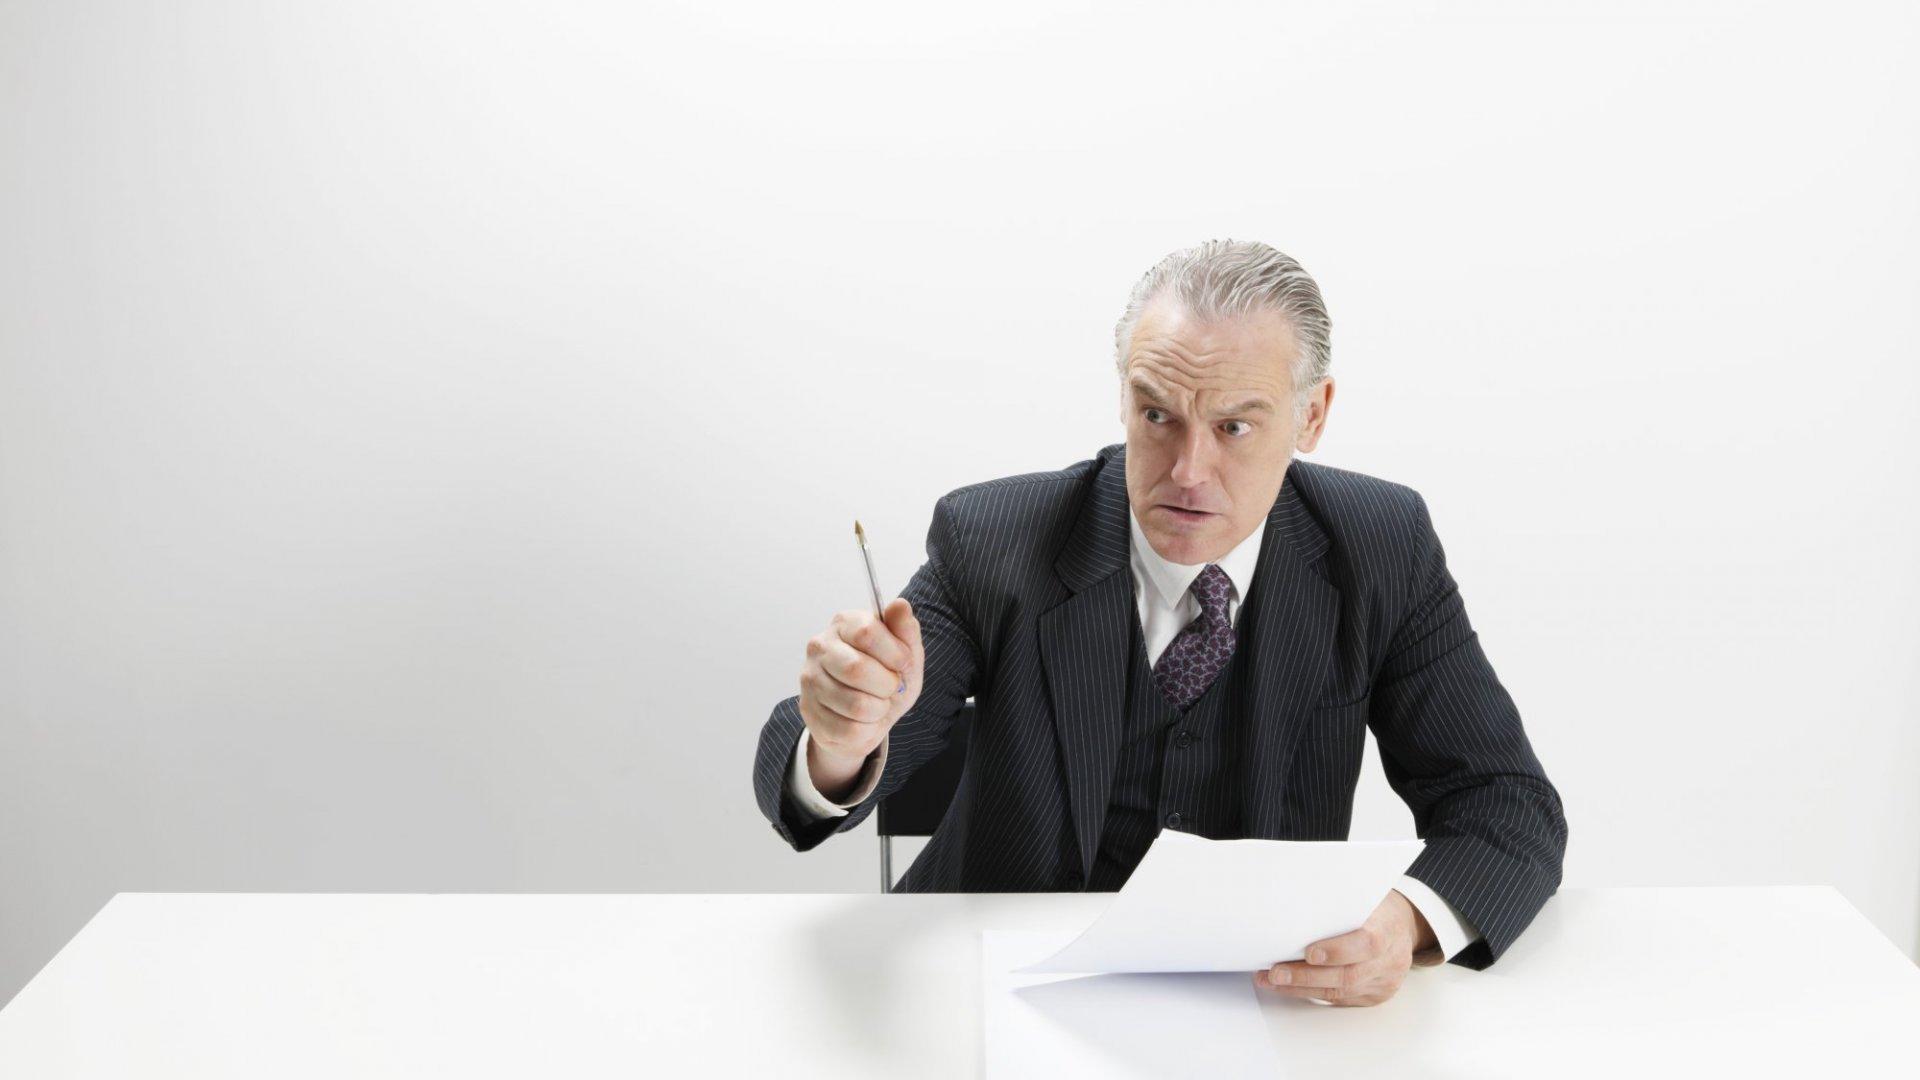 3 Not-So-Surprising Reasons Corporate America Kills Creativity